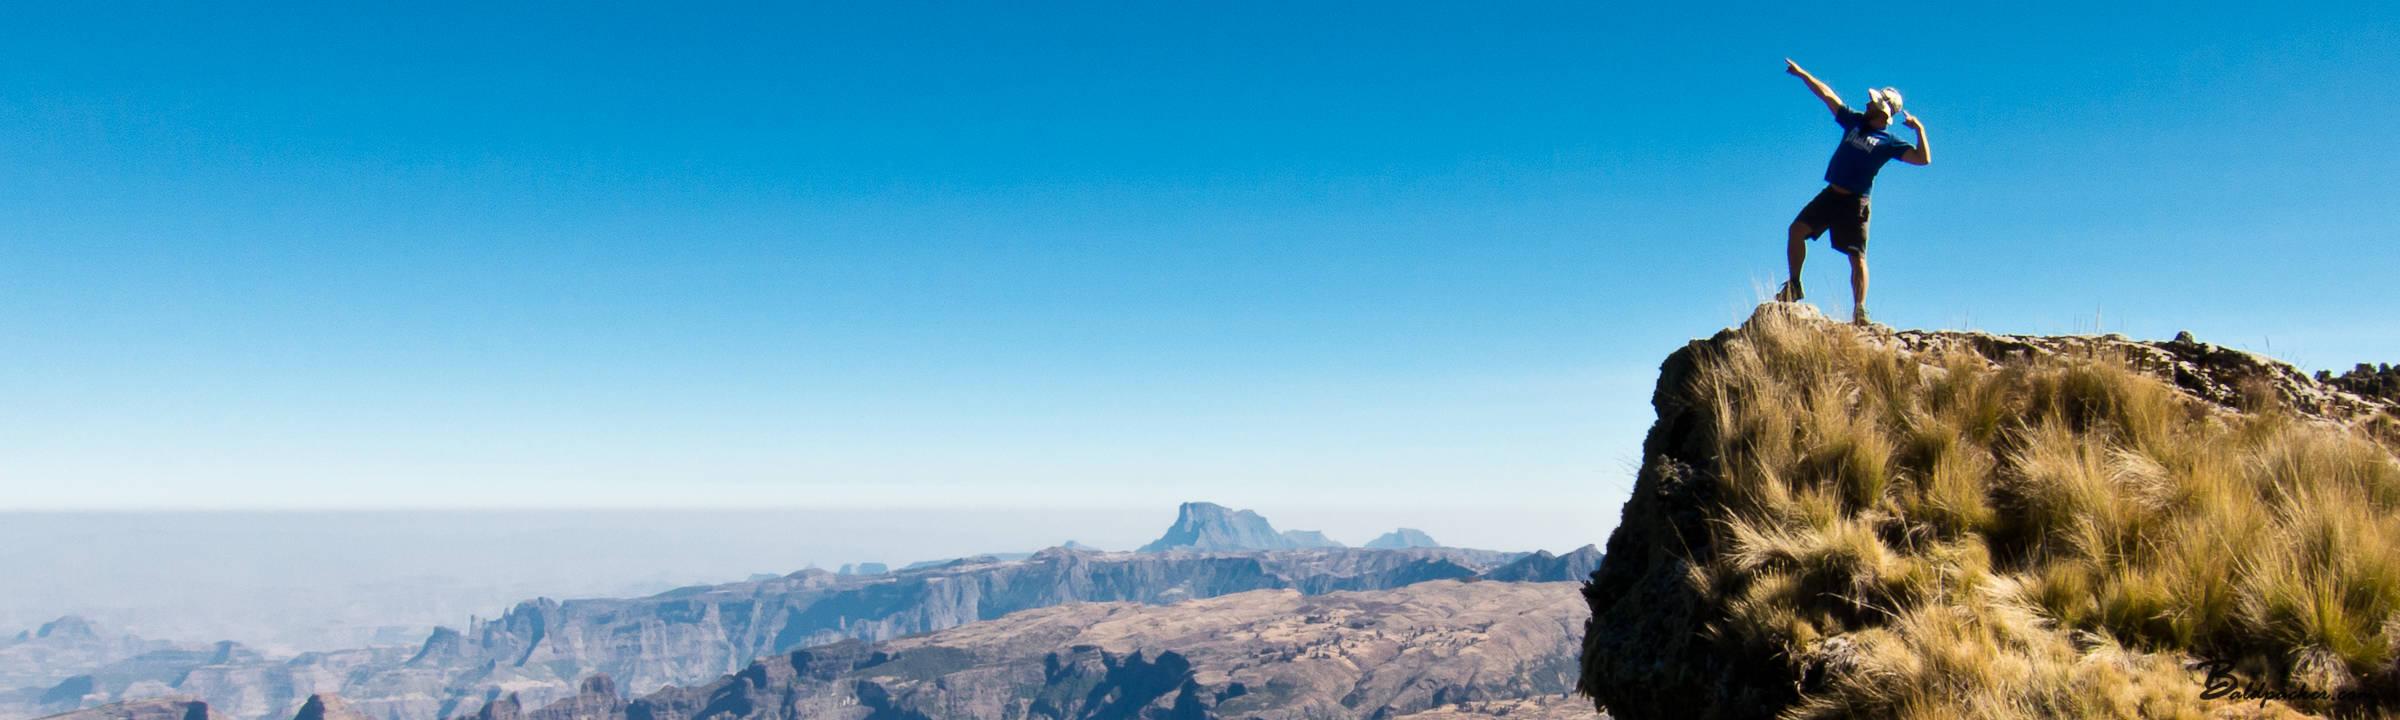 Ethiopia: Summiting the Simien Mountains Day 2 – Geech to Chenek